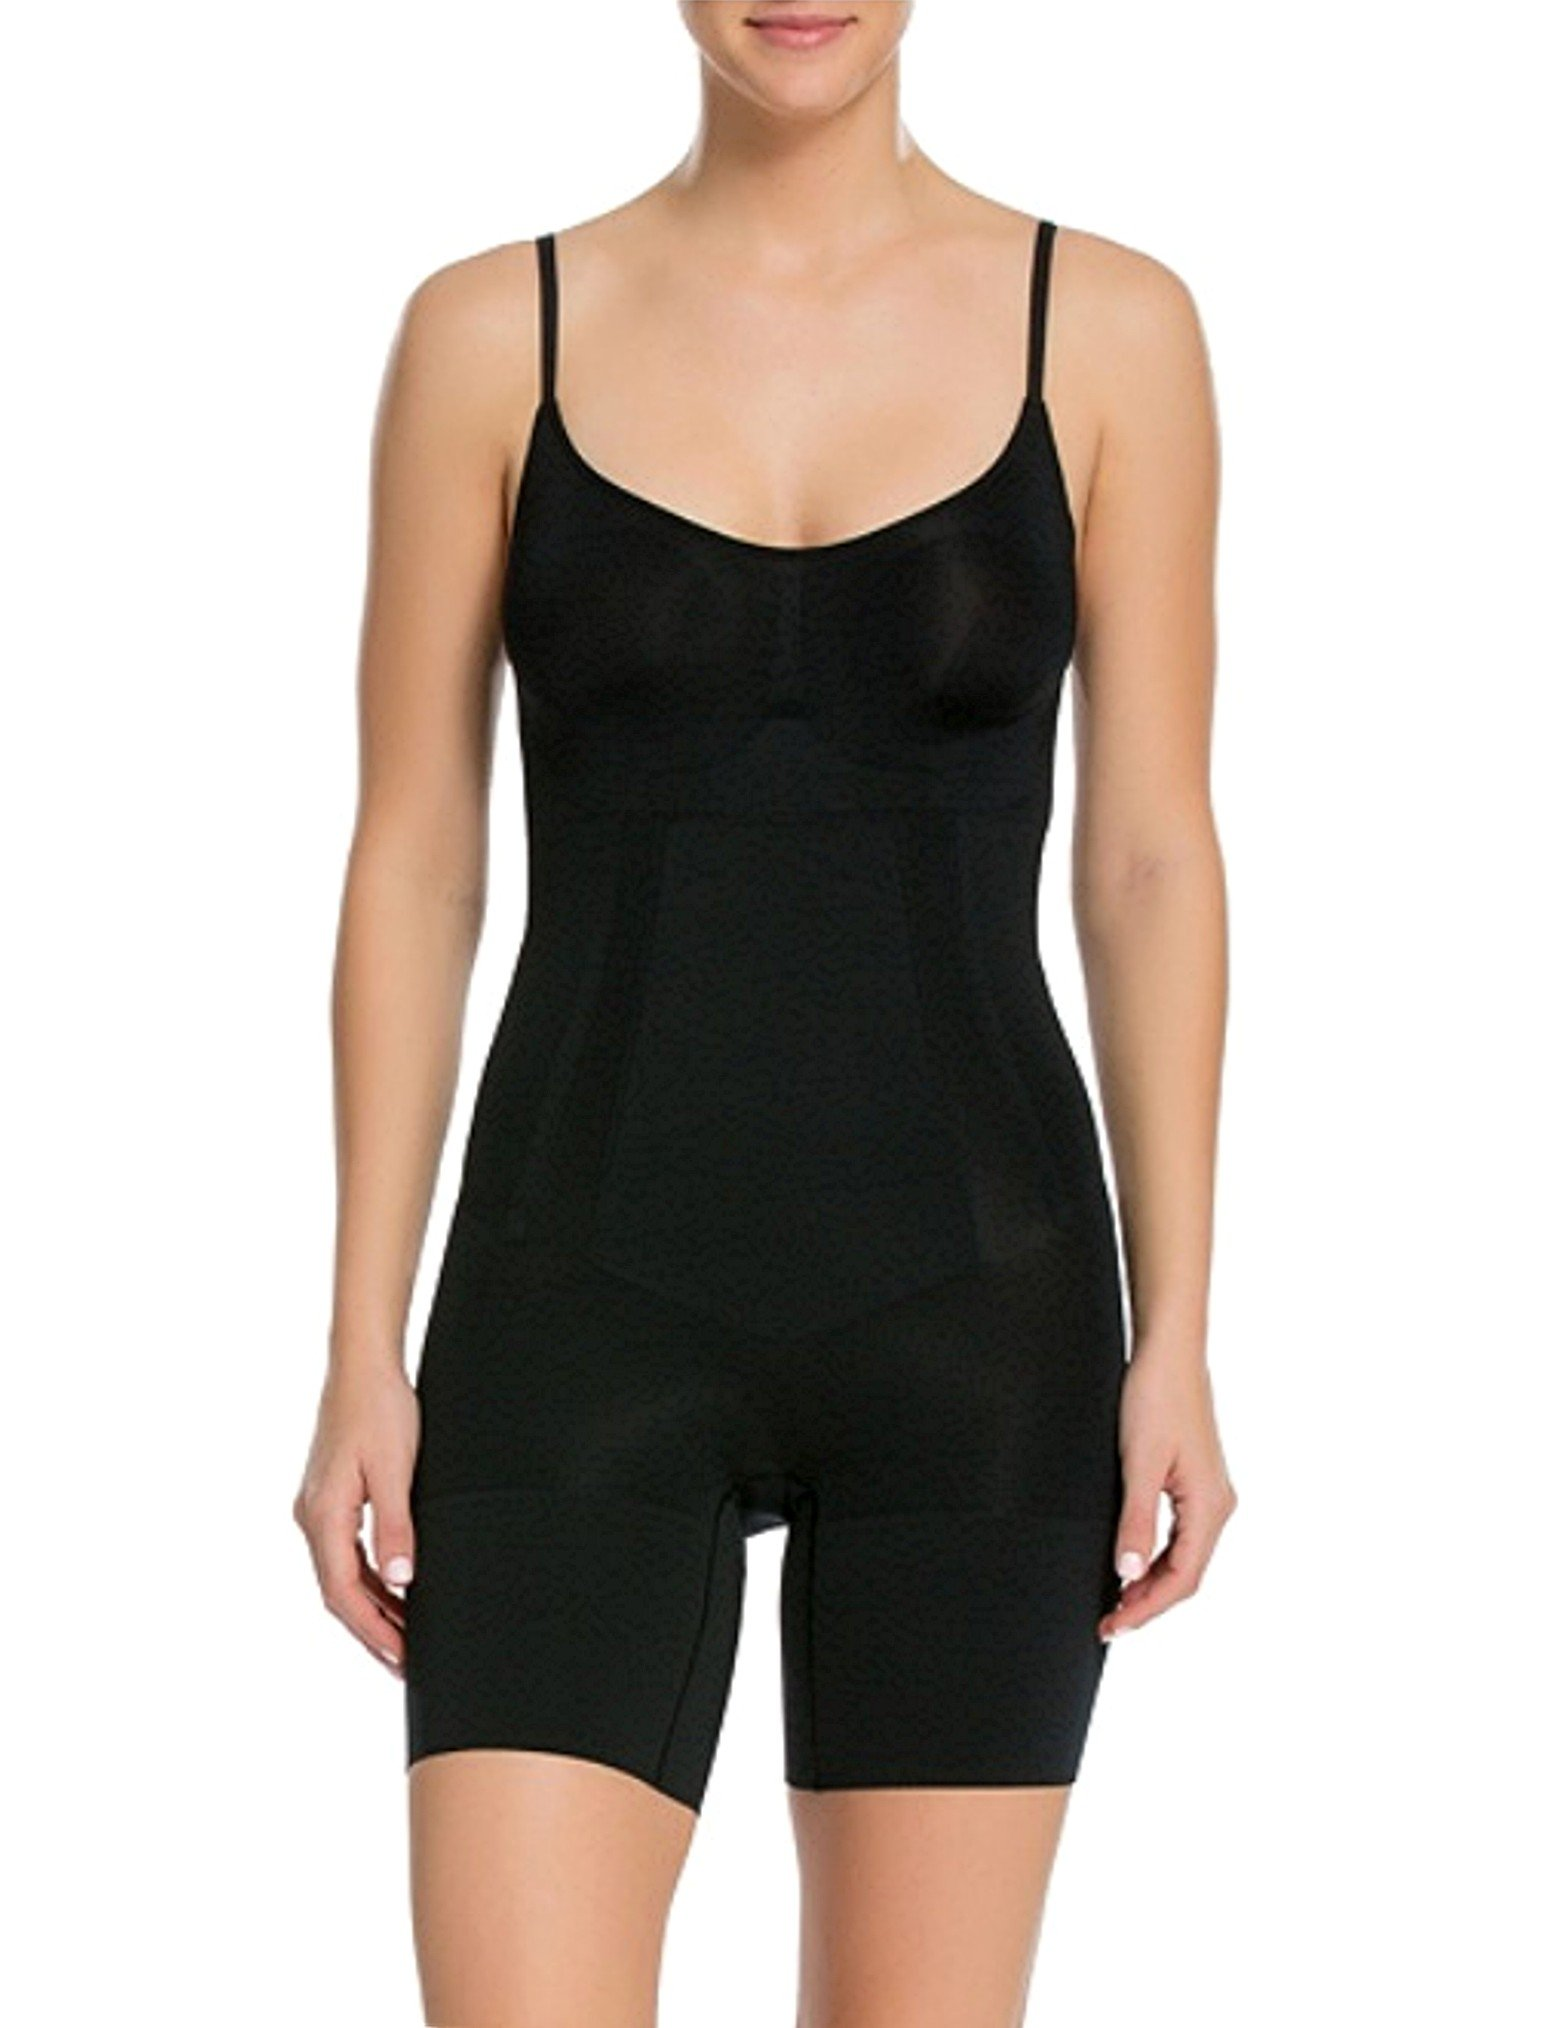 SPANX Plus Size OnCore Firm Control Bodysuit, 1X, Black